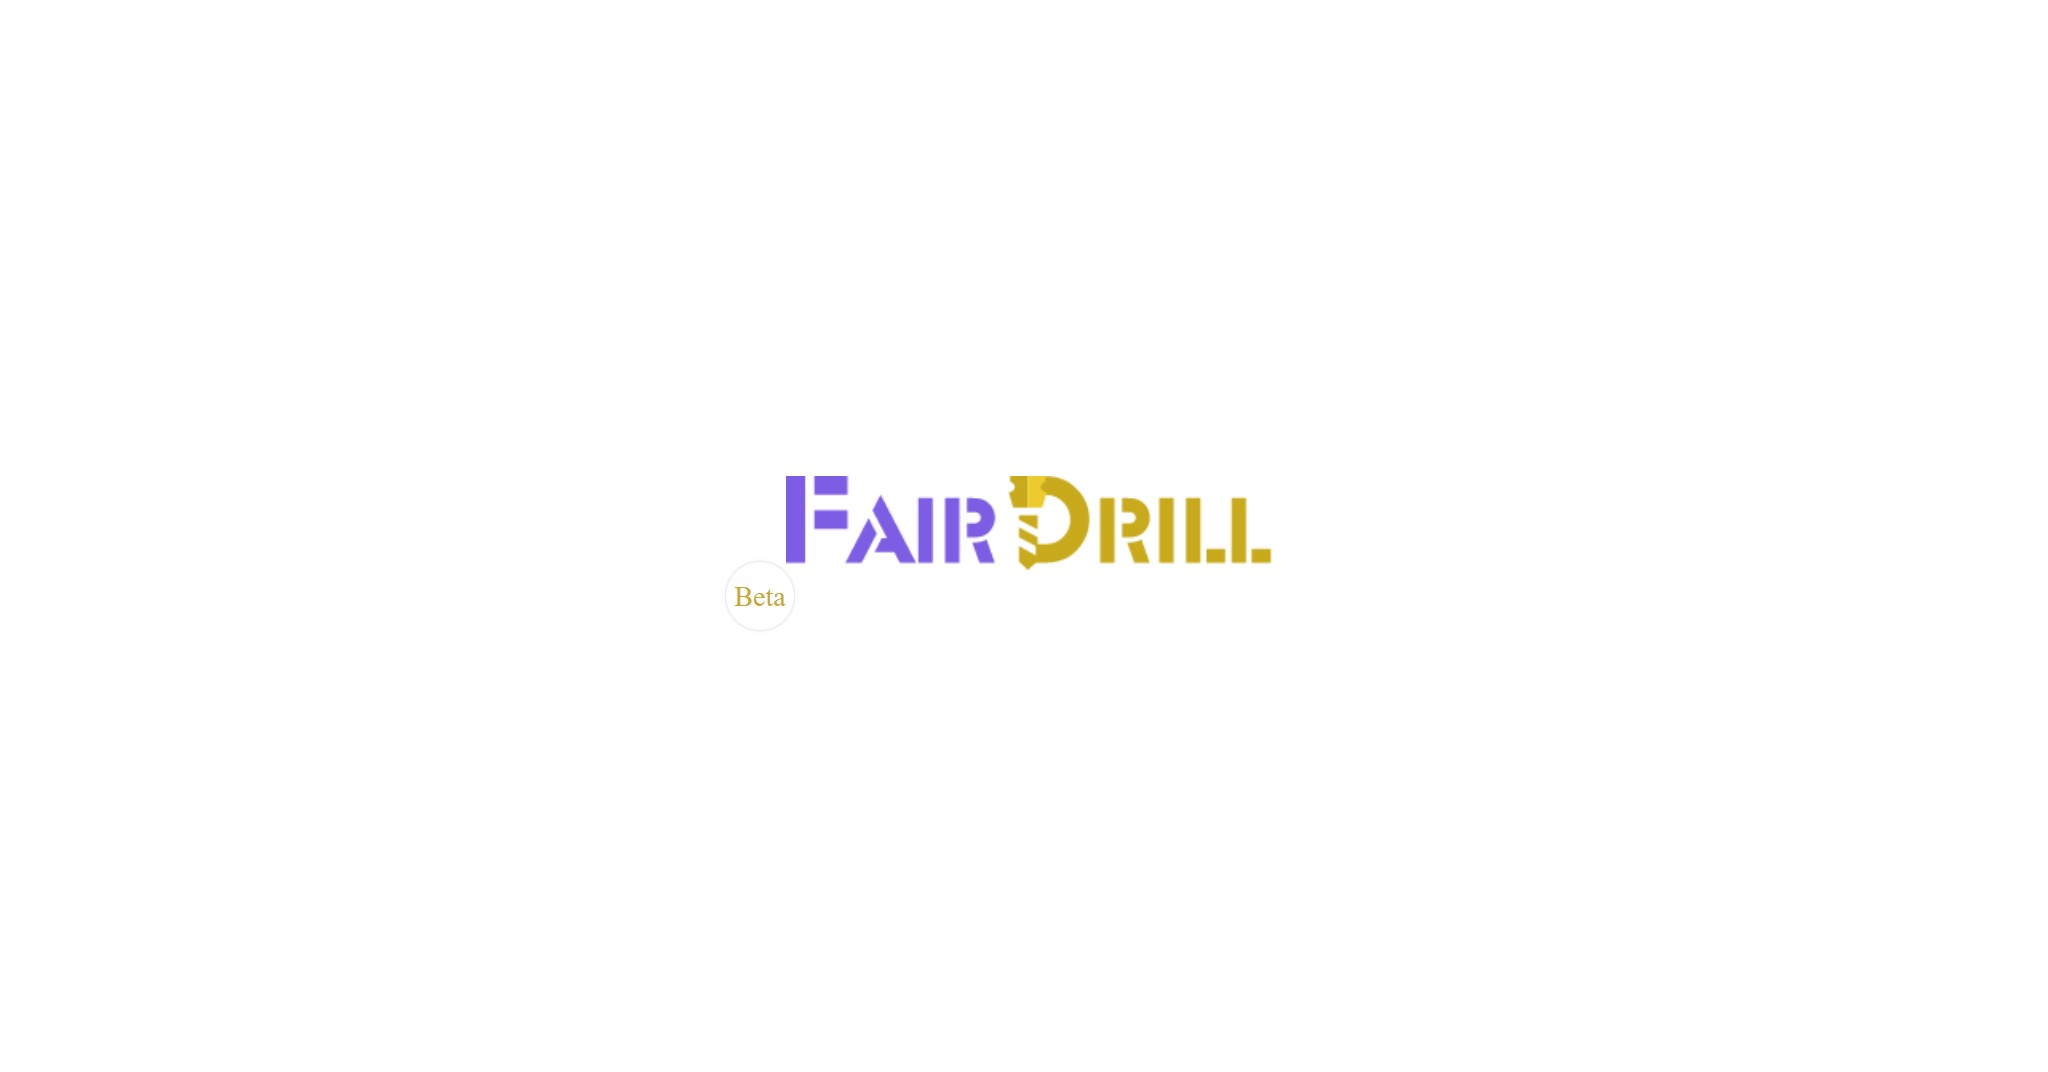 FairDrill